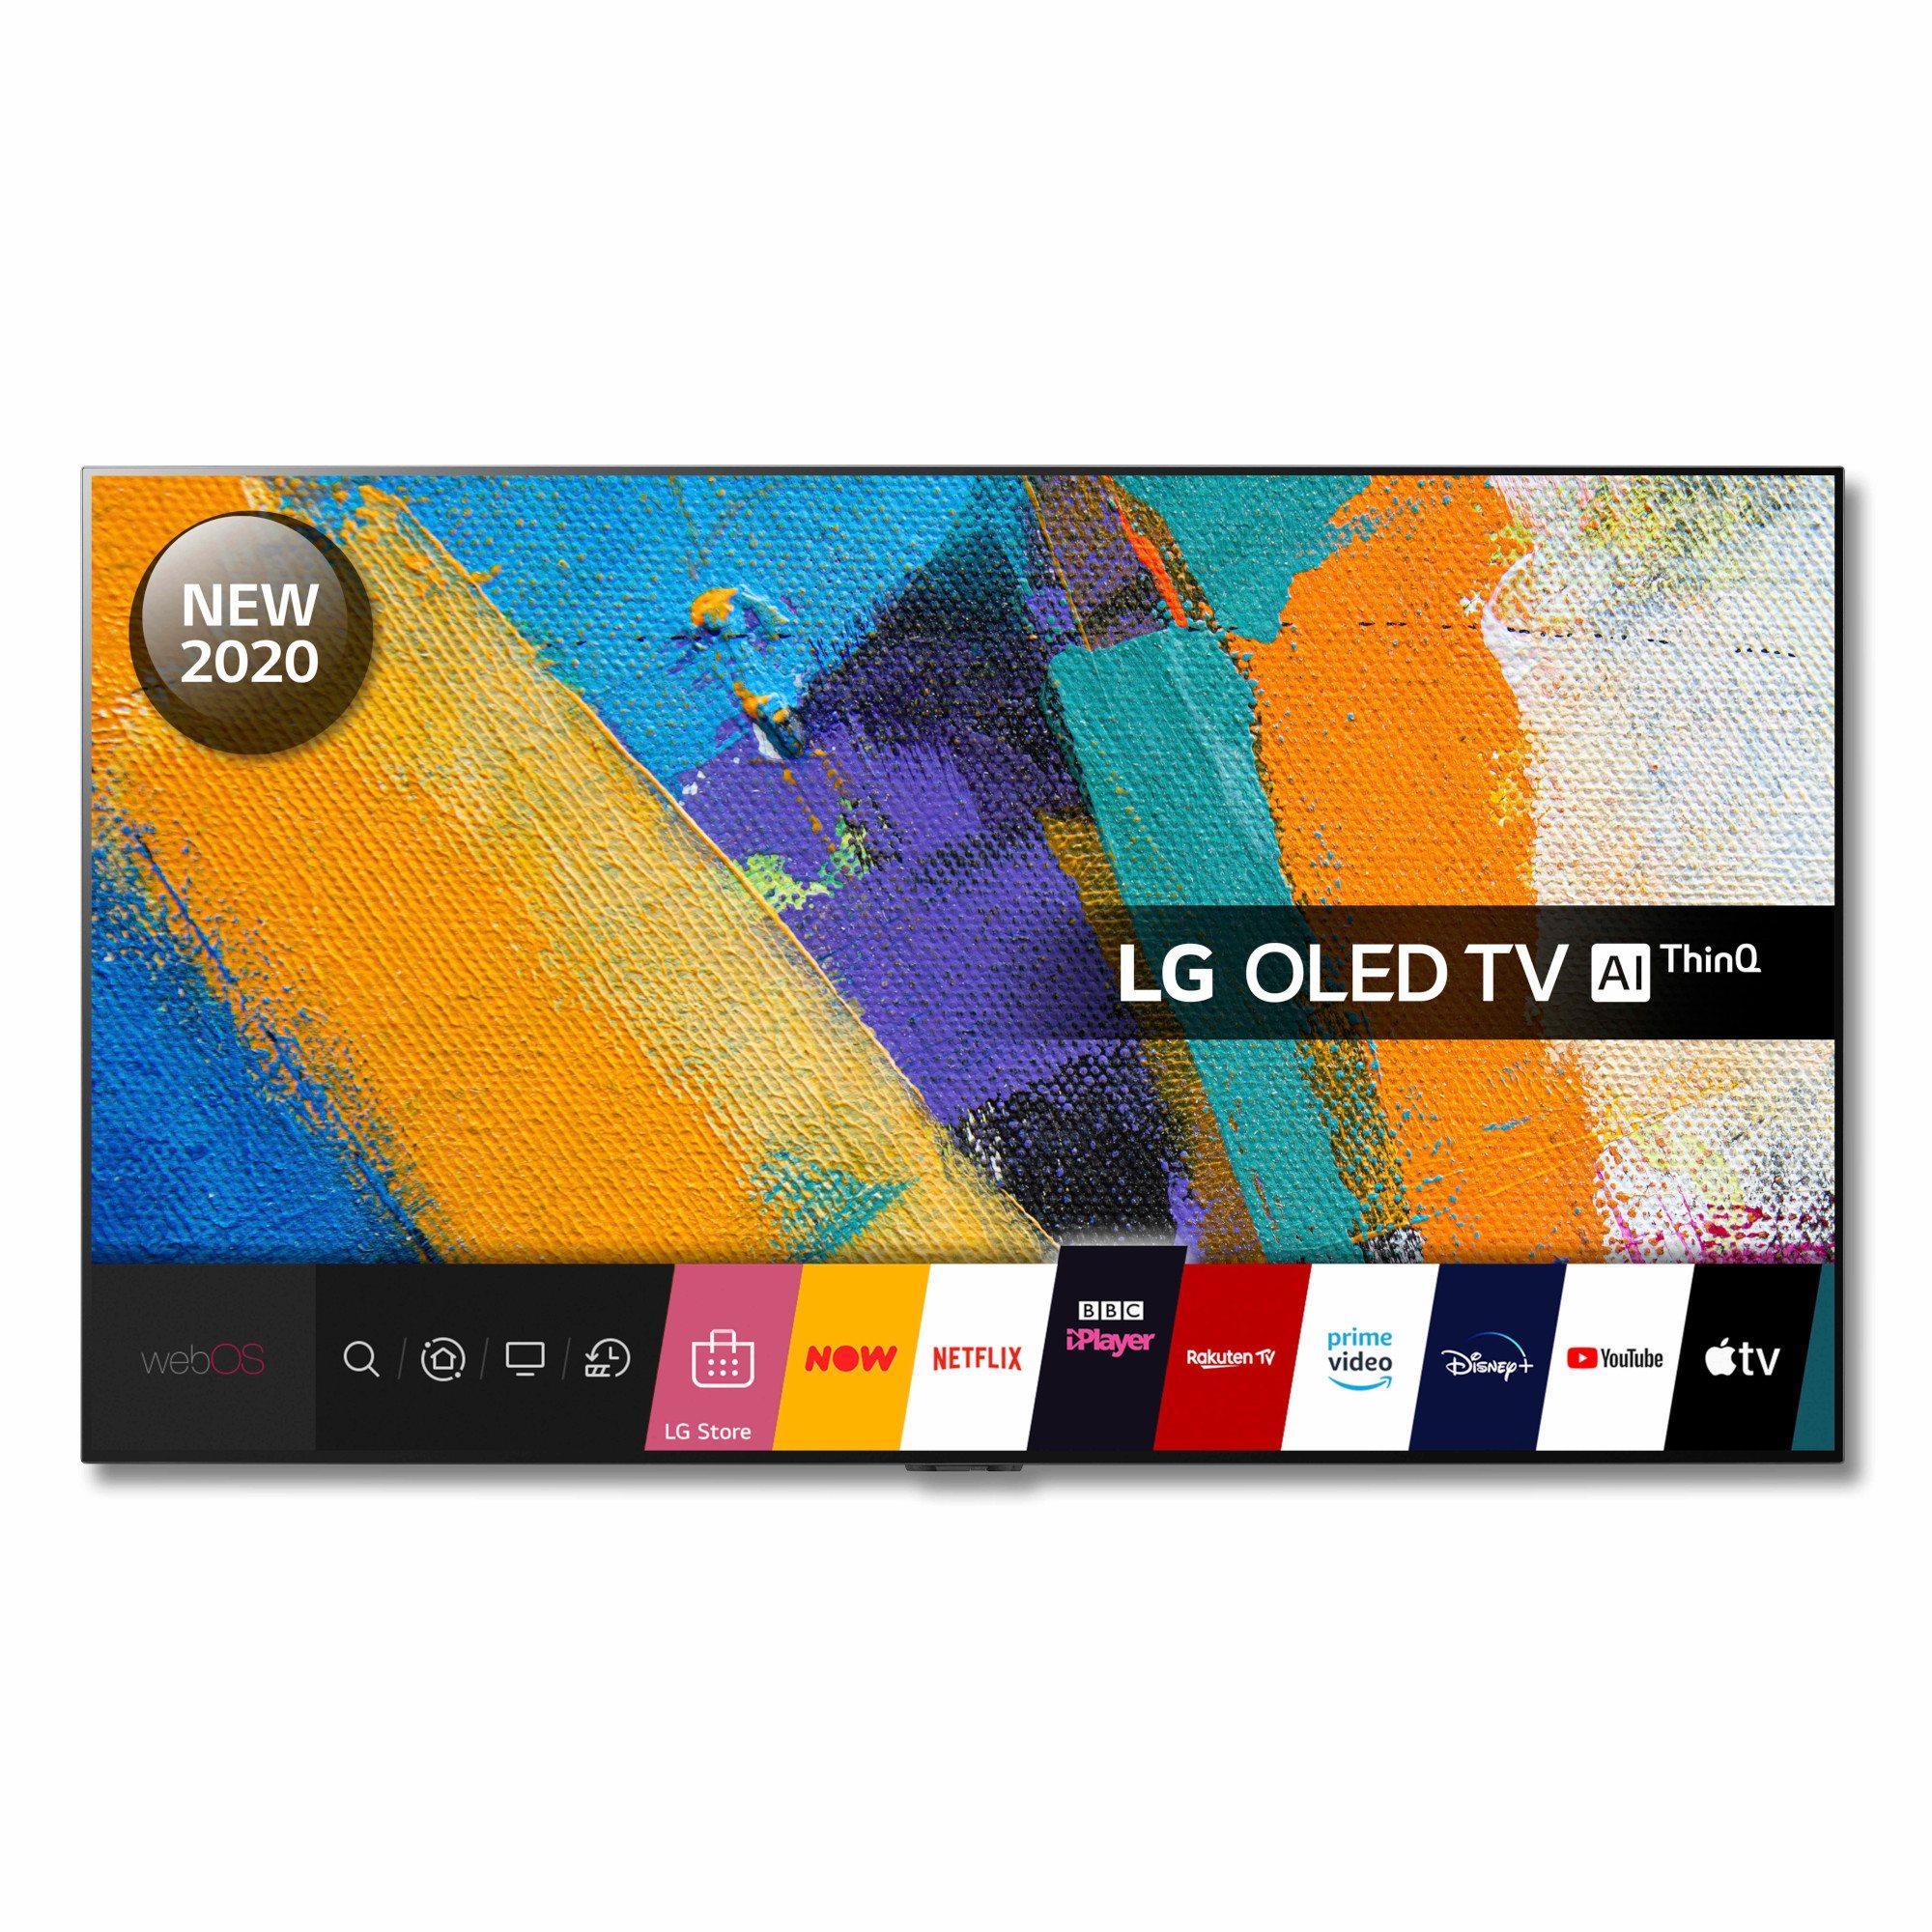 LG OLED55GX6LA With 5yr Guarantee - £1,599 @ Hughes (+£100 Gift Card)